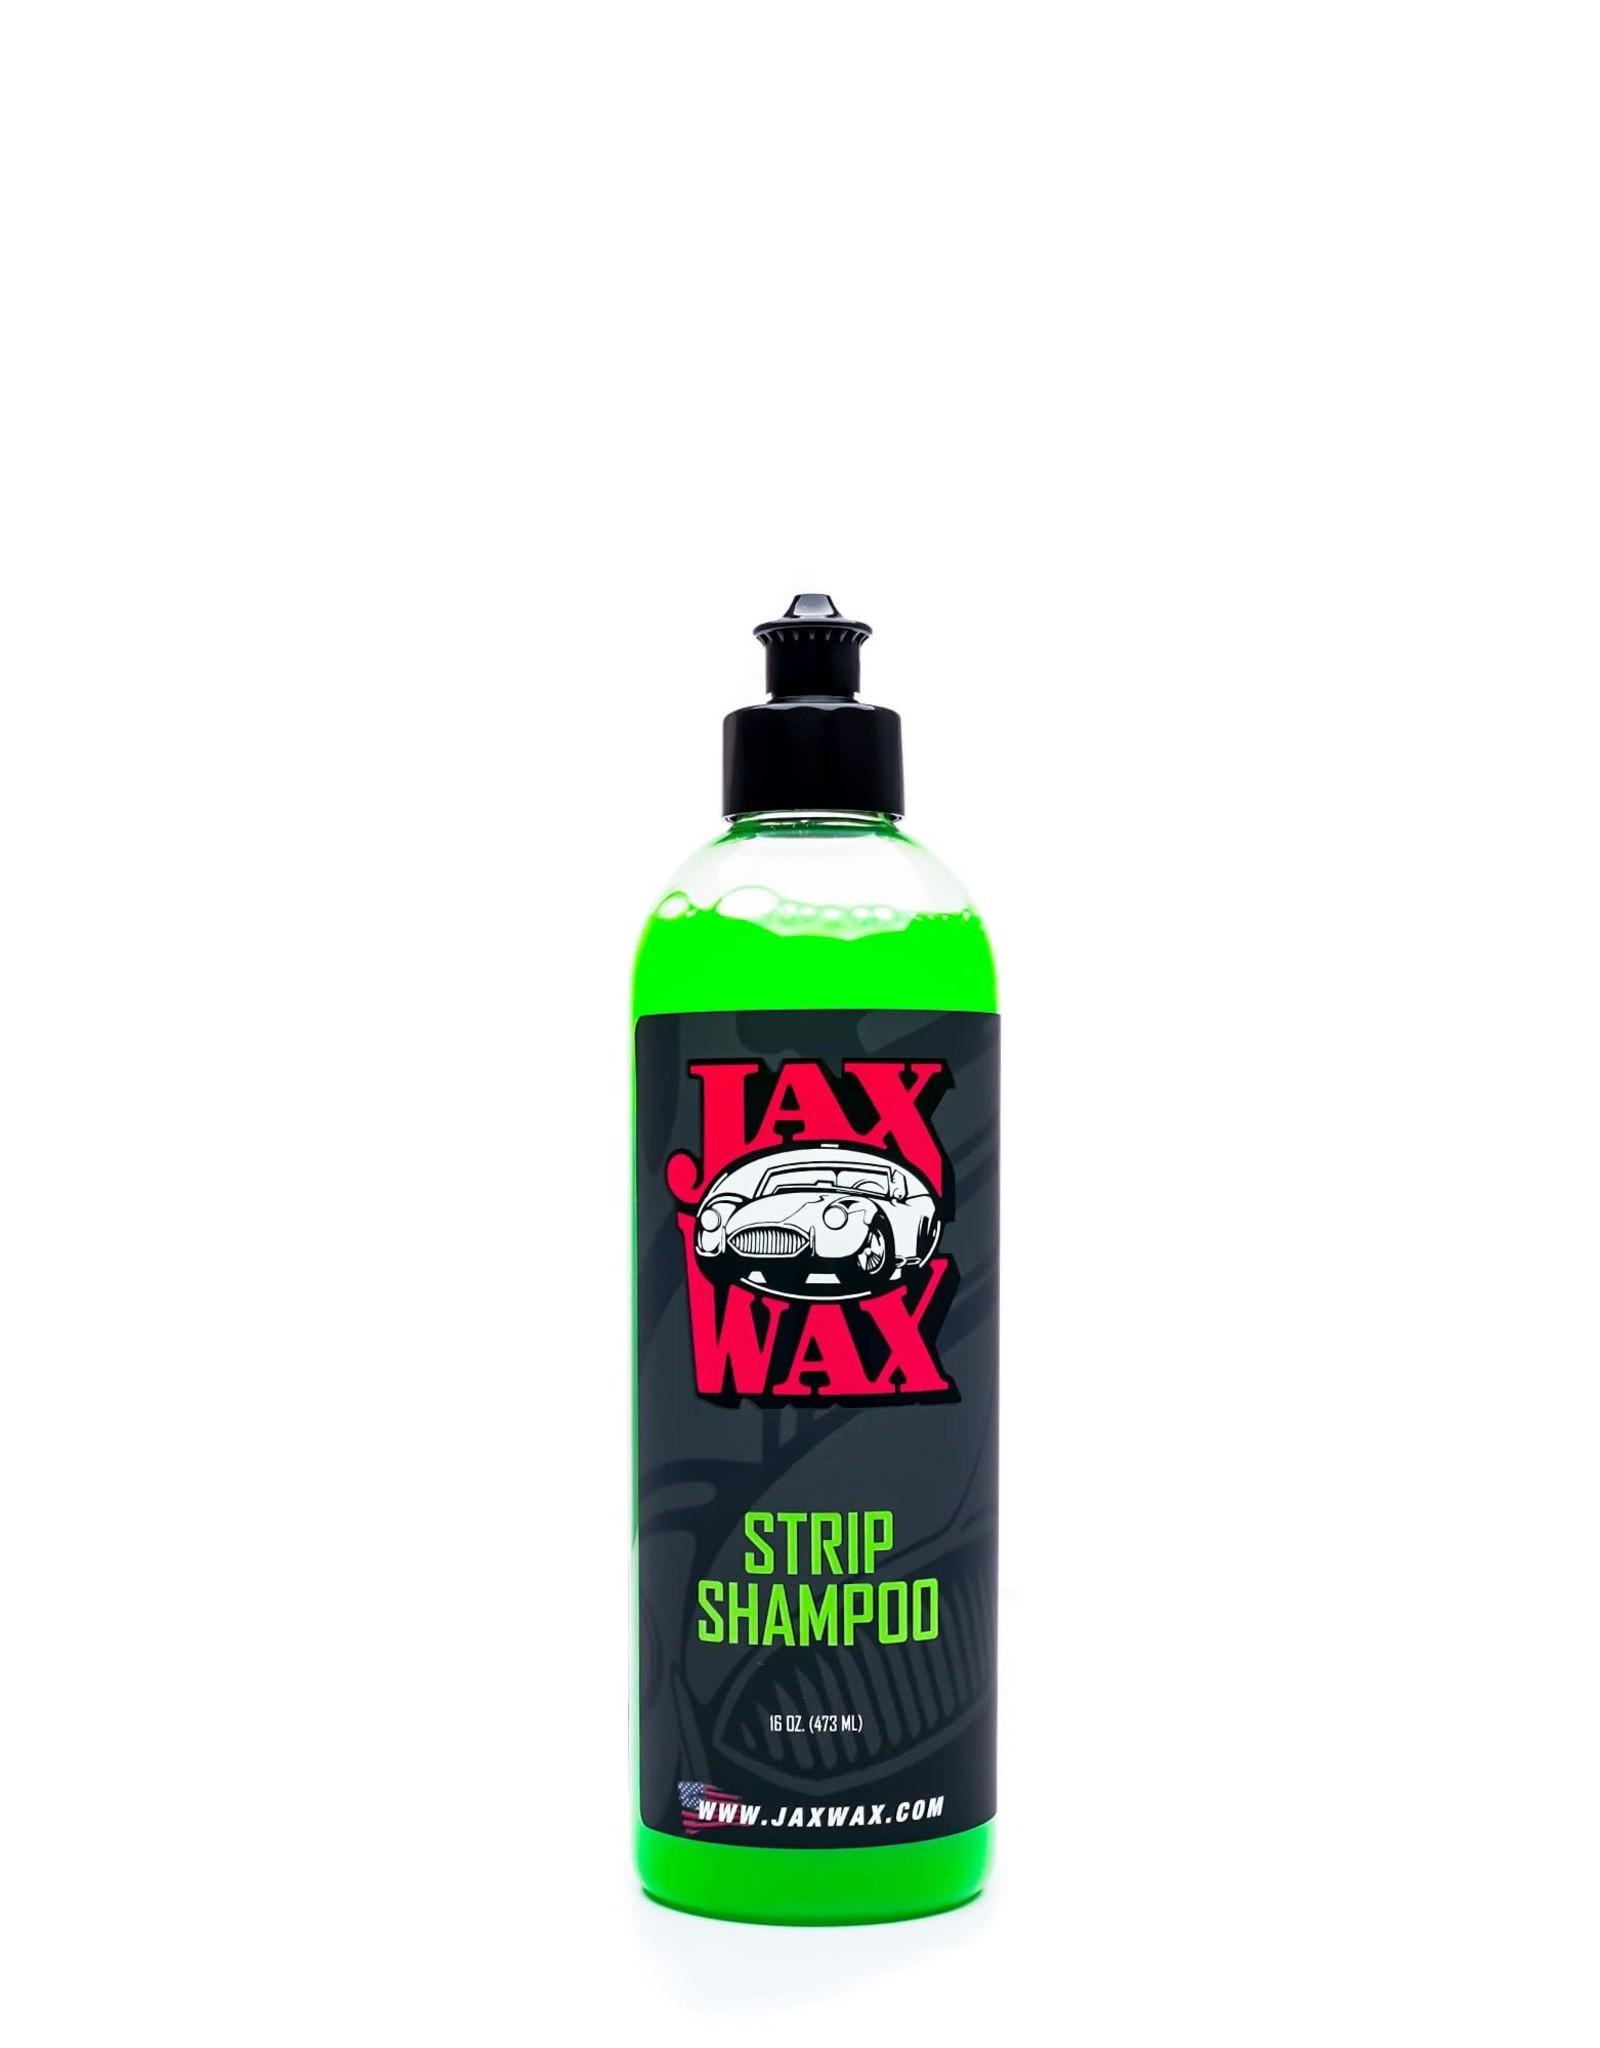 Strip Shampoo 16oz